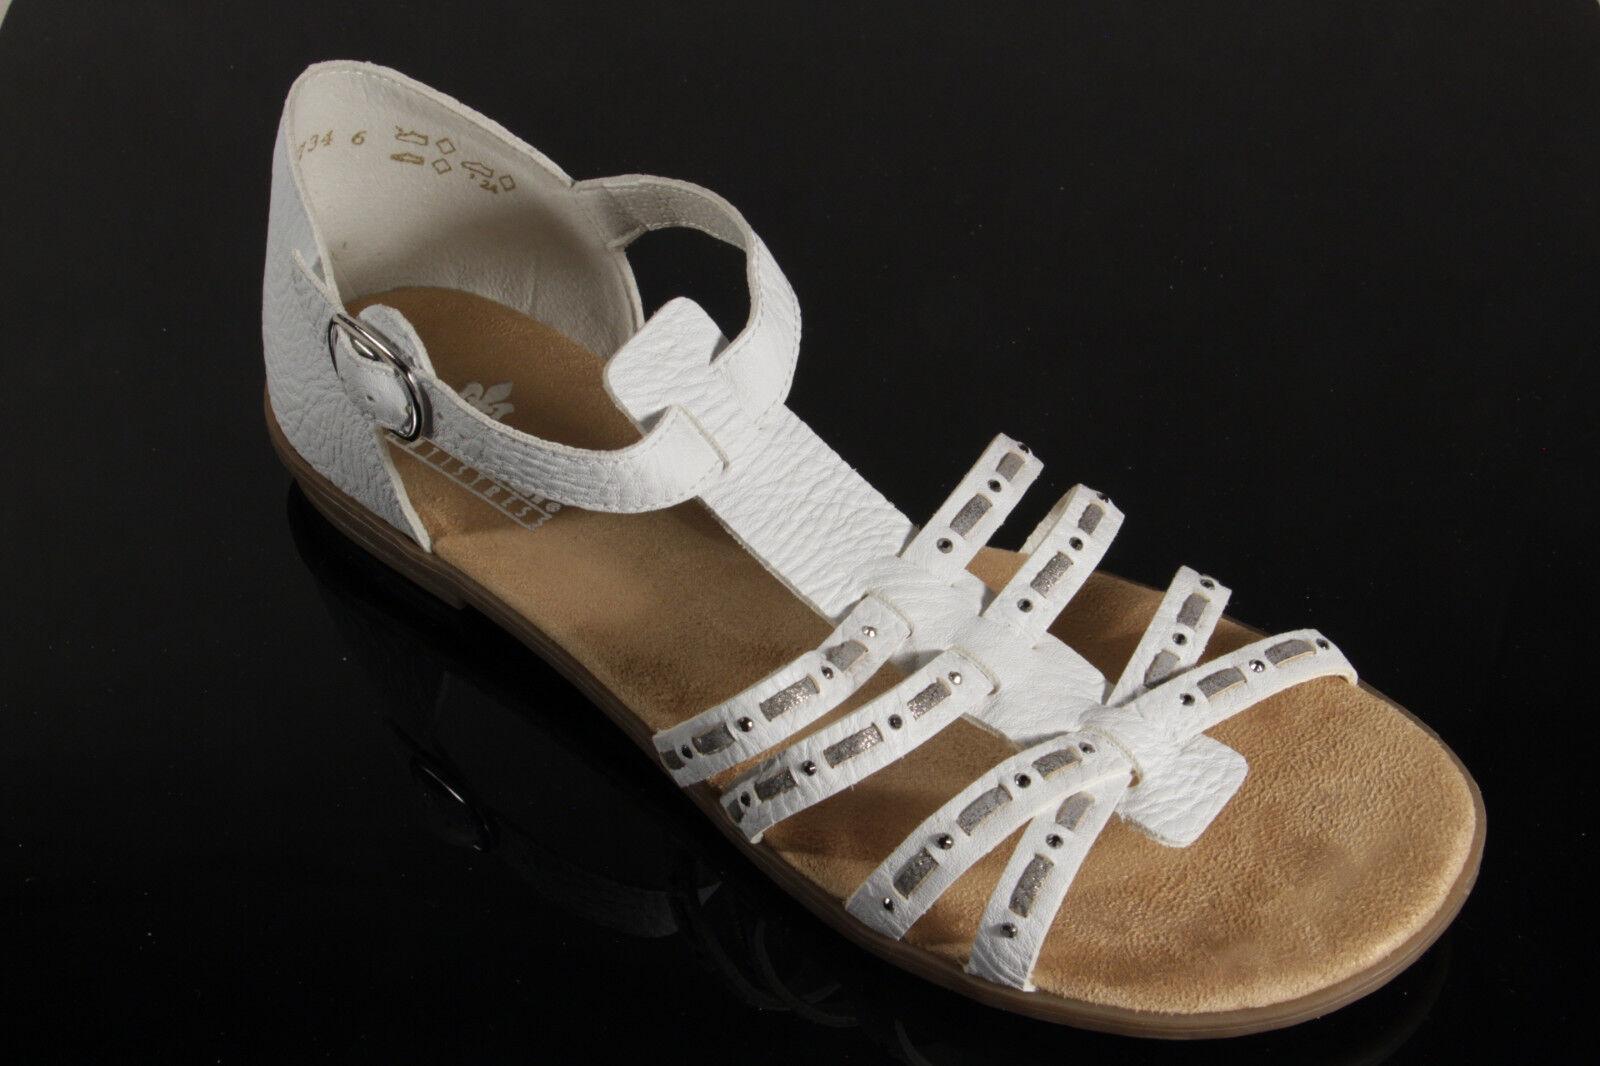 Rieker Damen Sandalen Sandaletten weiss weiche Innensohle 64274 64274 64274 NEU   603eca